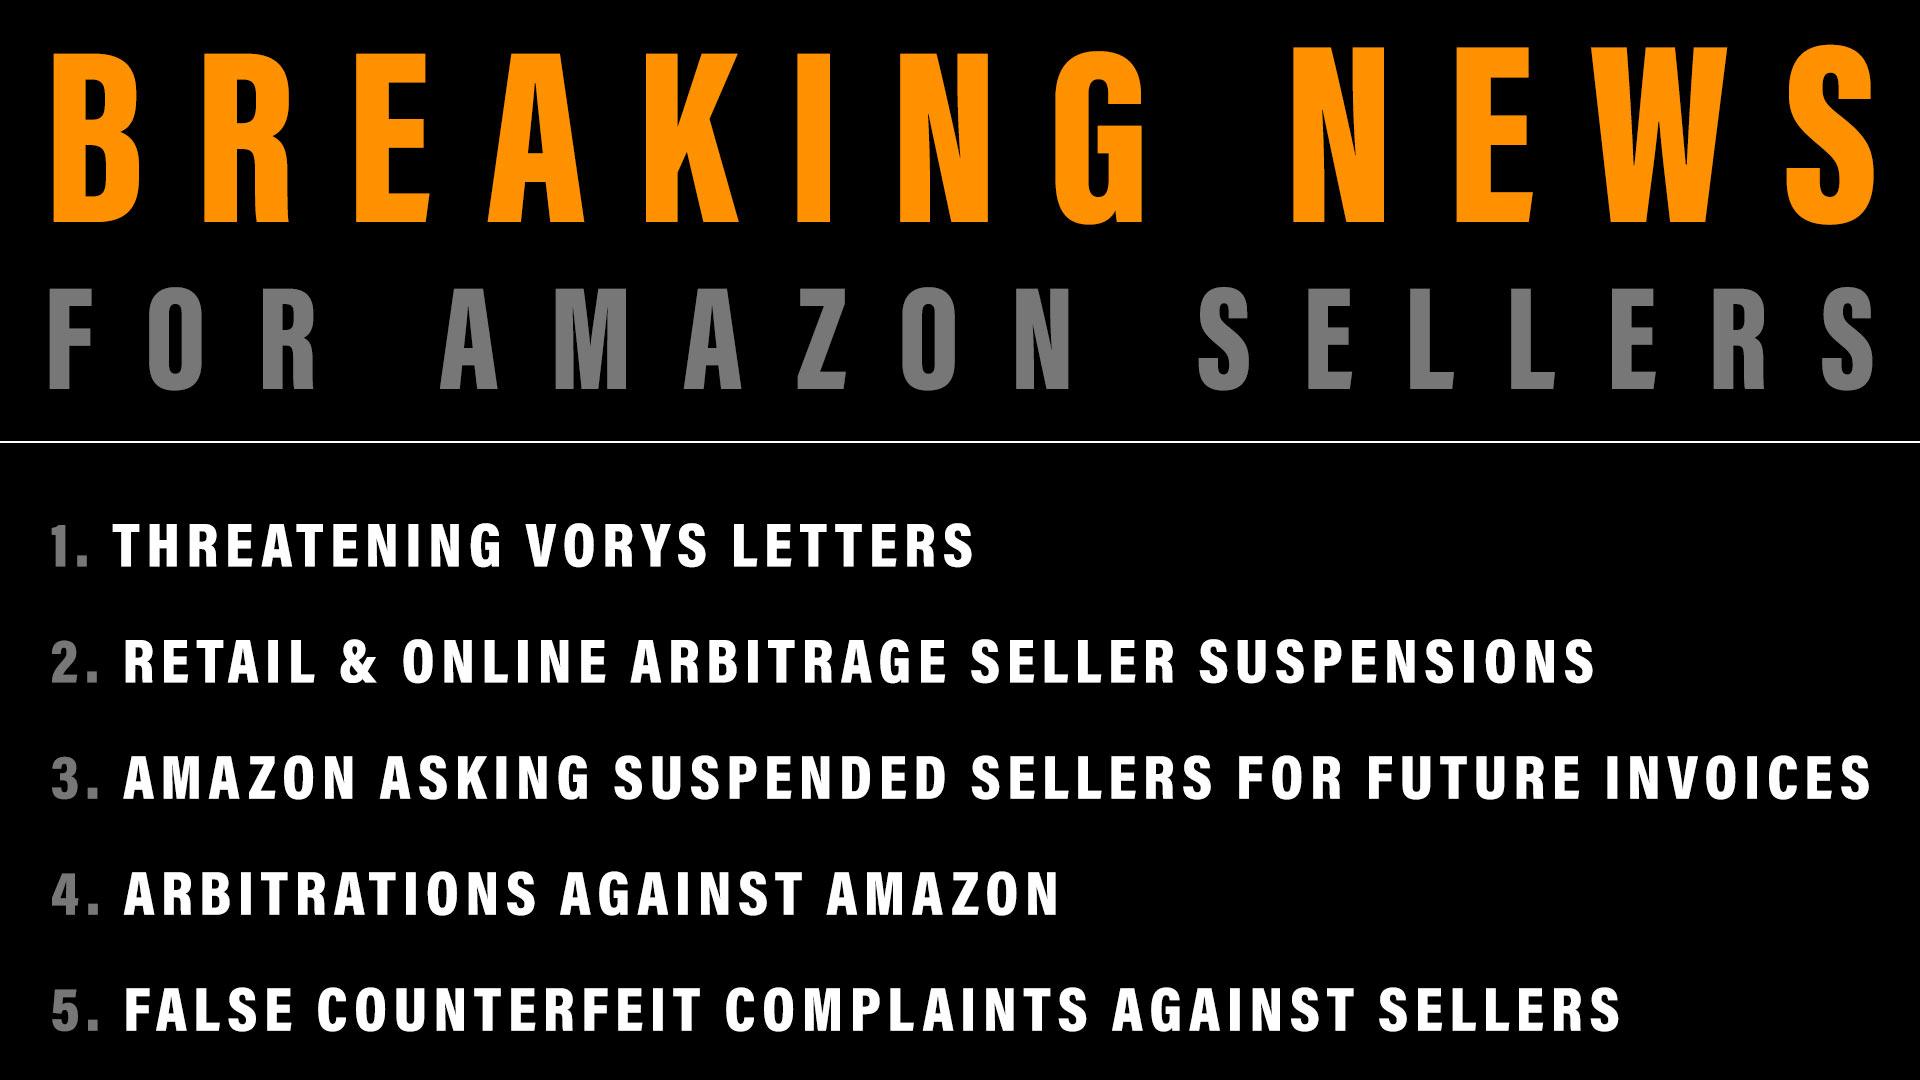 Amazon Seller News: VORYS LETTERS, RETAIL & ONLINE ARBITRAGE, AMAZON ASKING SUSPENDED SELLERS FOR FUTURE INVOICES, ARBITRATION AGAINST AMAZON, FALSE COUNTERFEIT COMPLAINTS